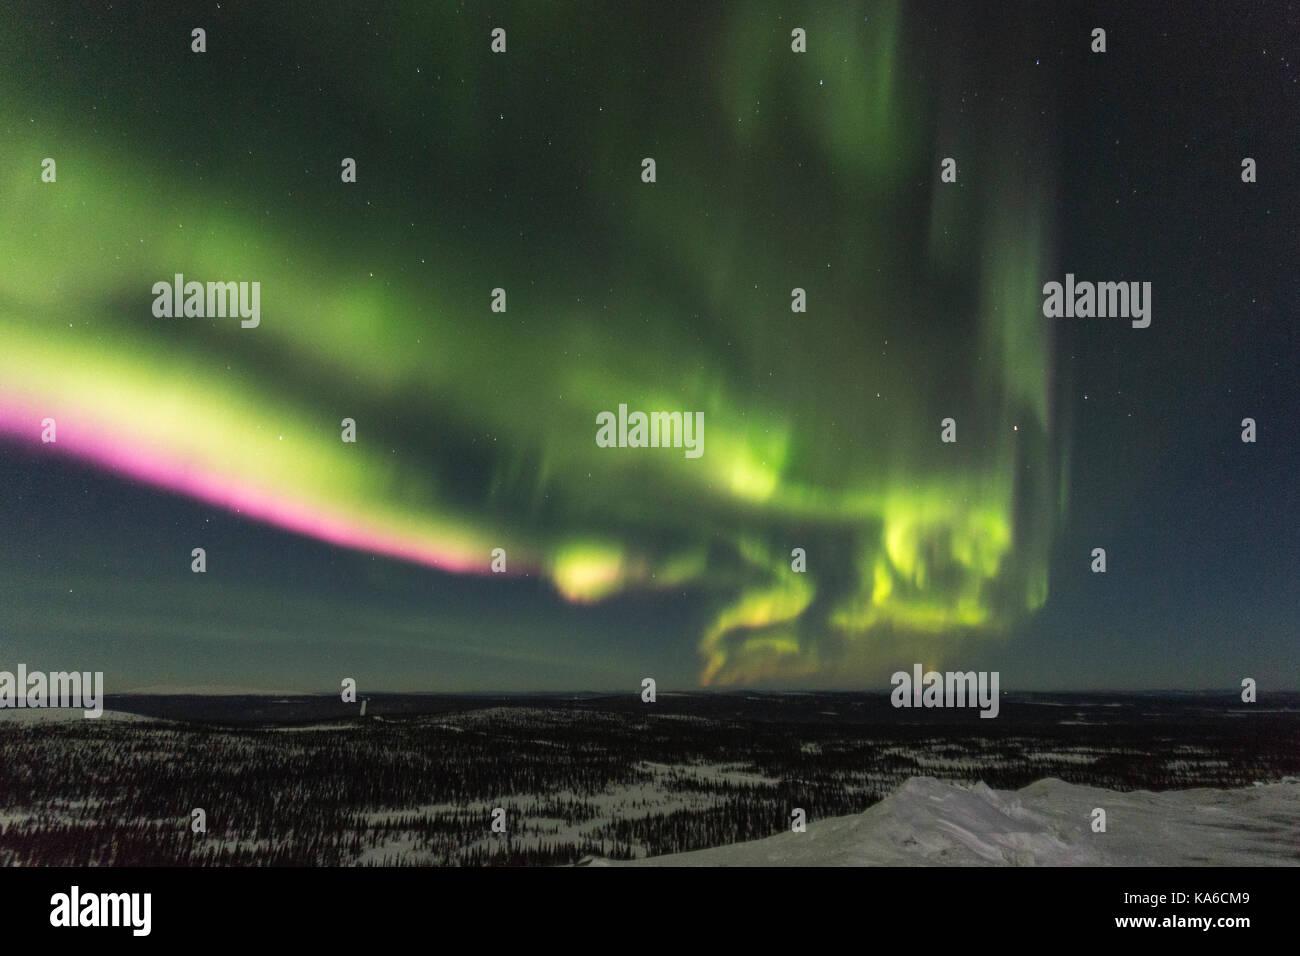 Northern light, Aurora borealis over winter landscape, Gällivare, Swedish Lapland, Sweden - Stock Image